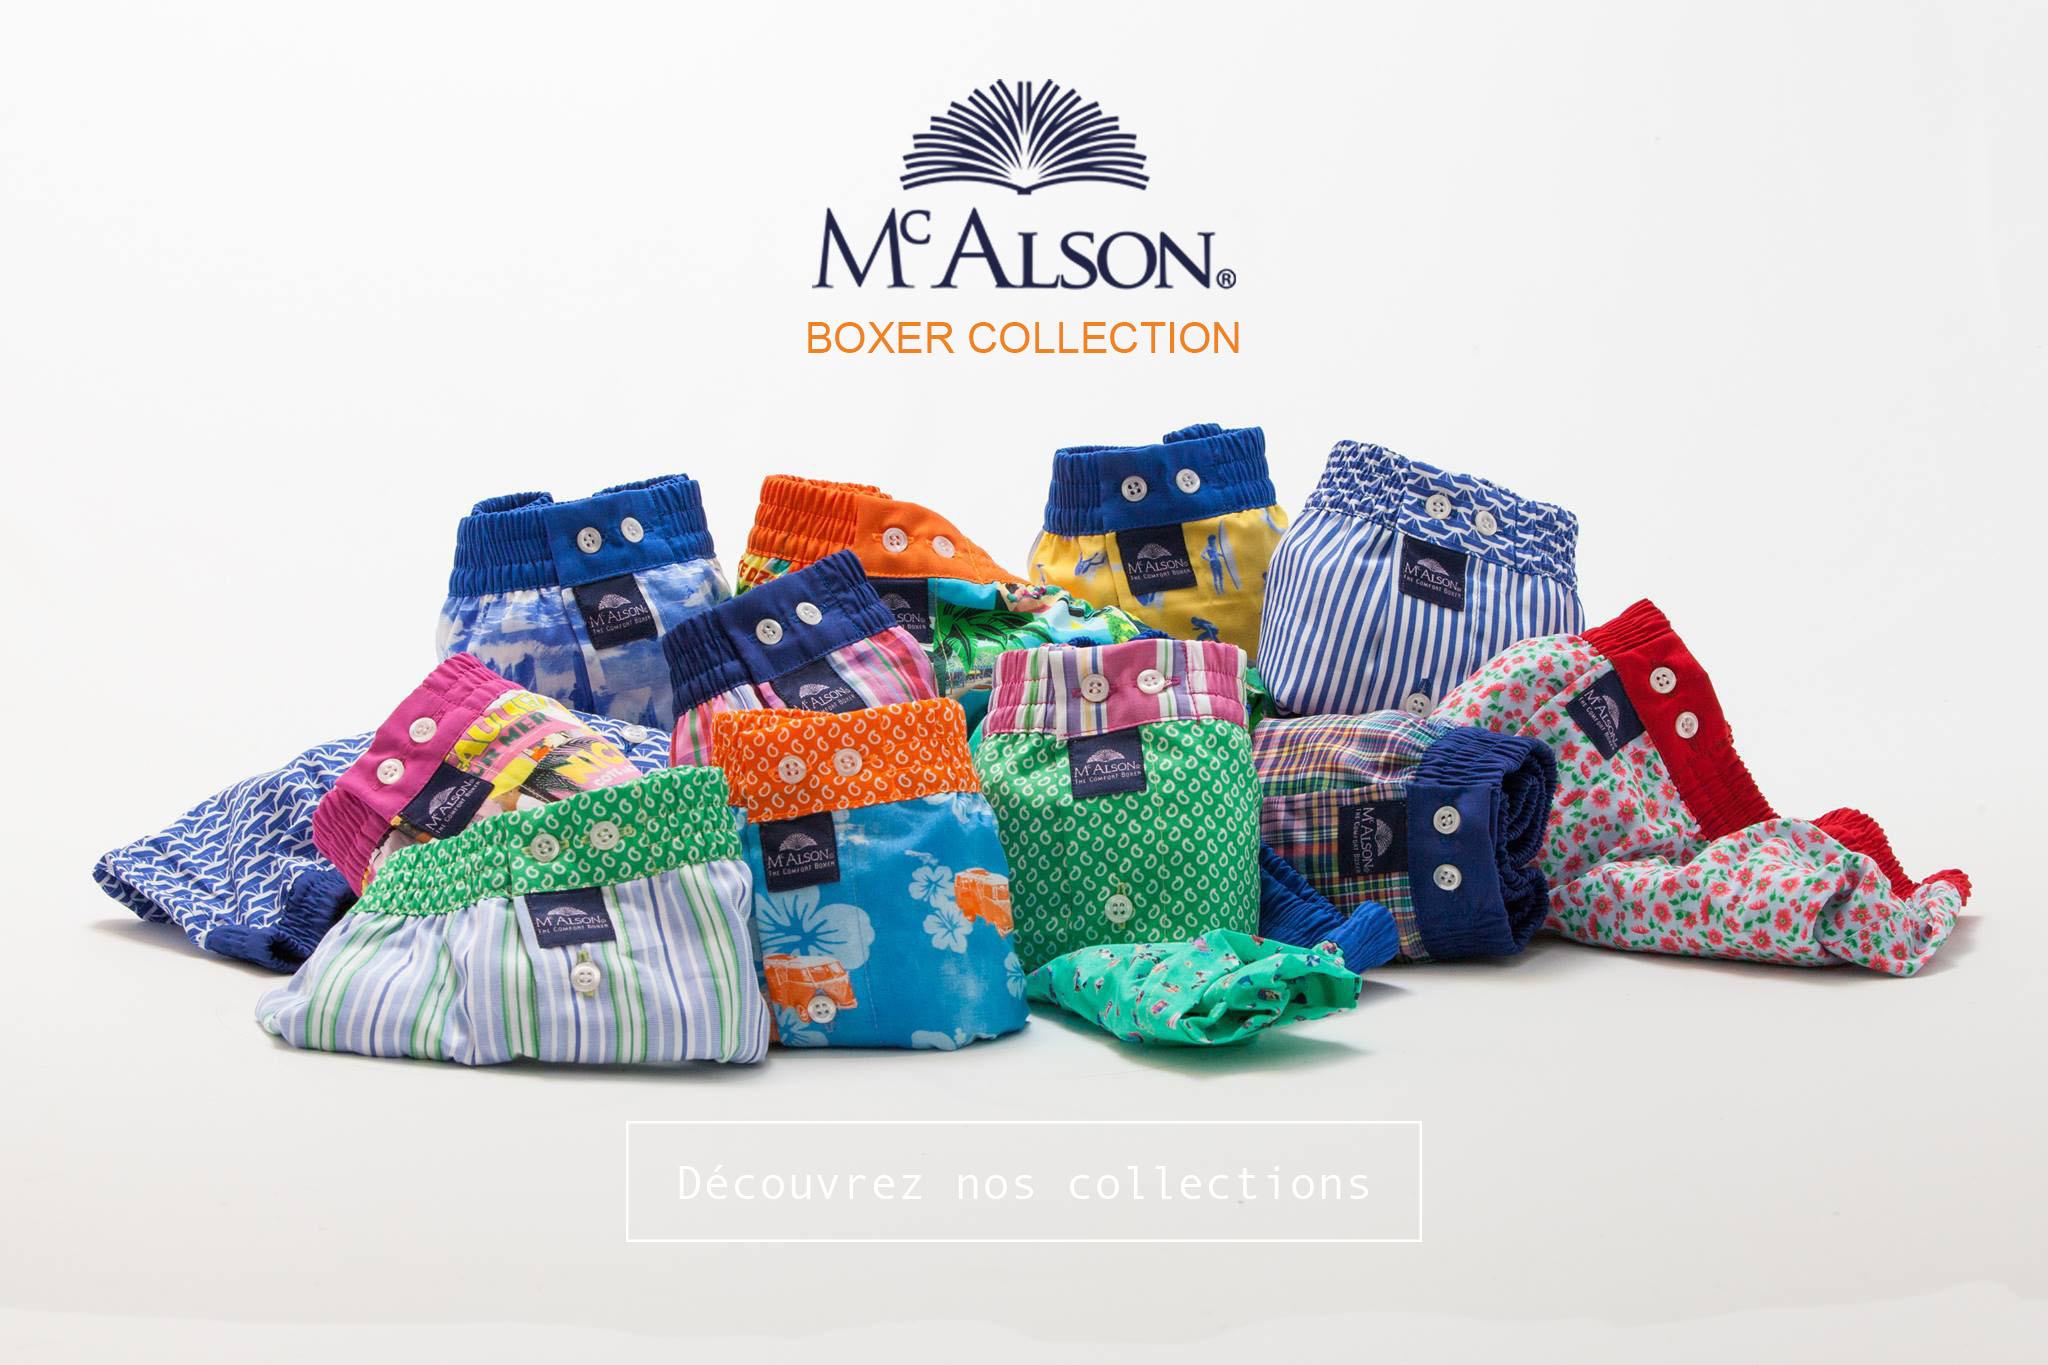 Mc Alson Collections